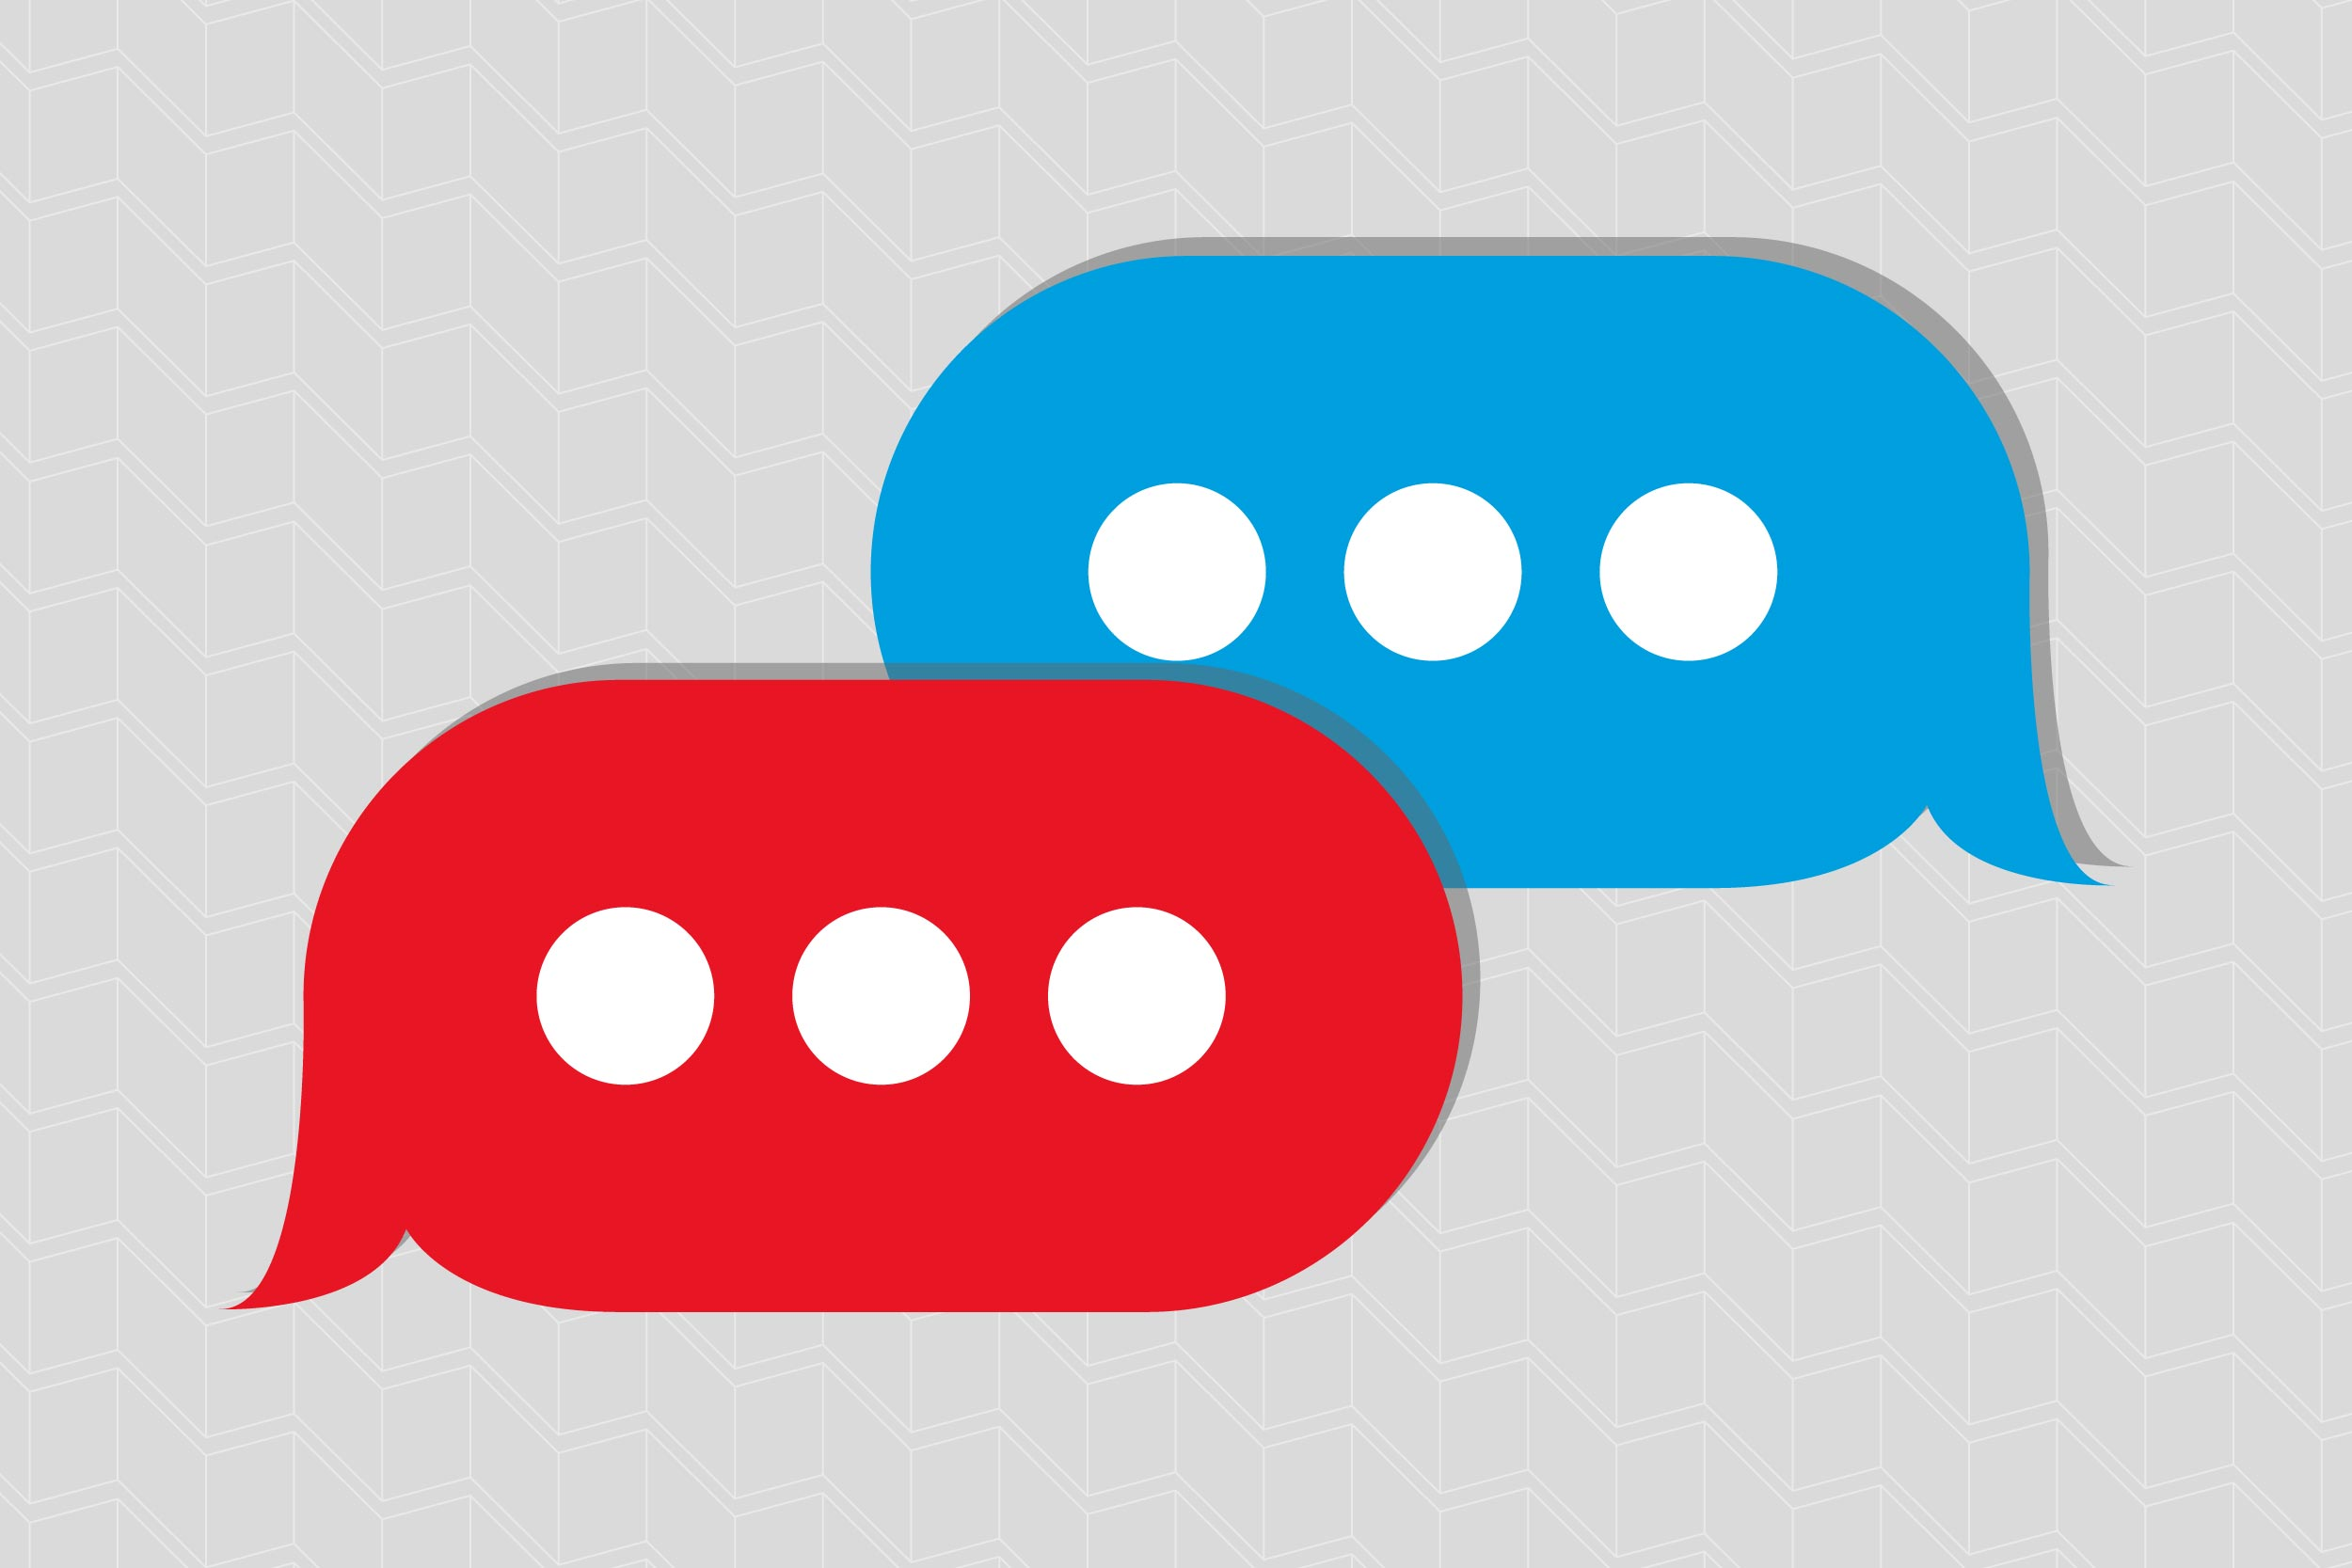 Improving Dialogue Across the Political Divide